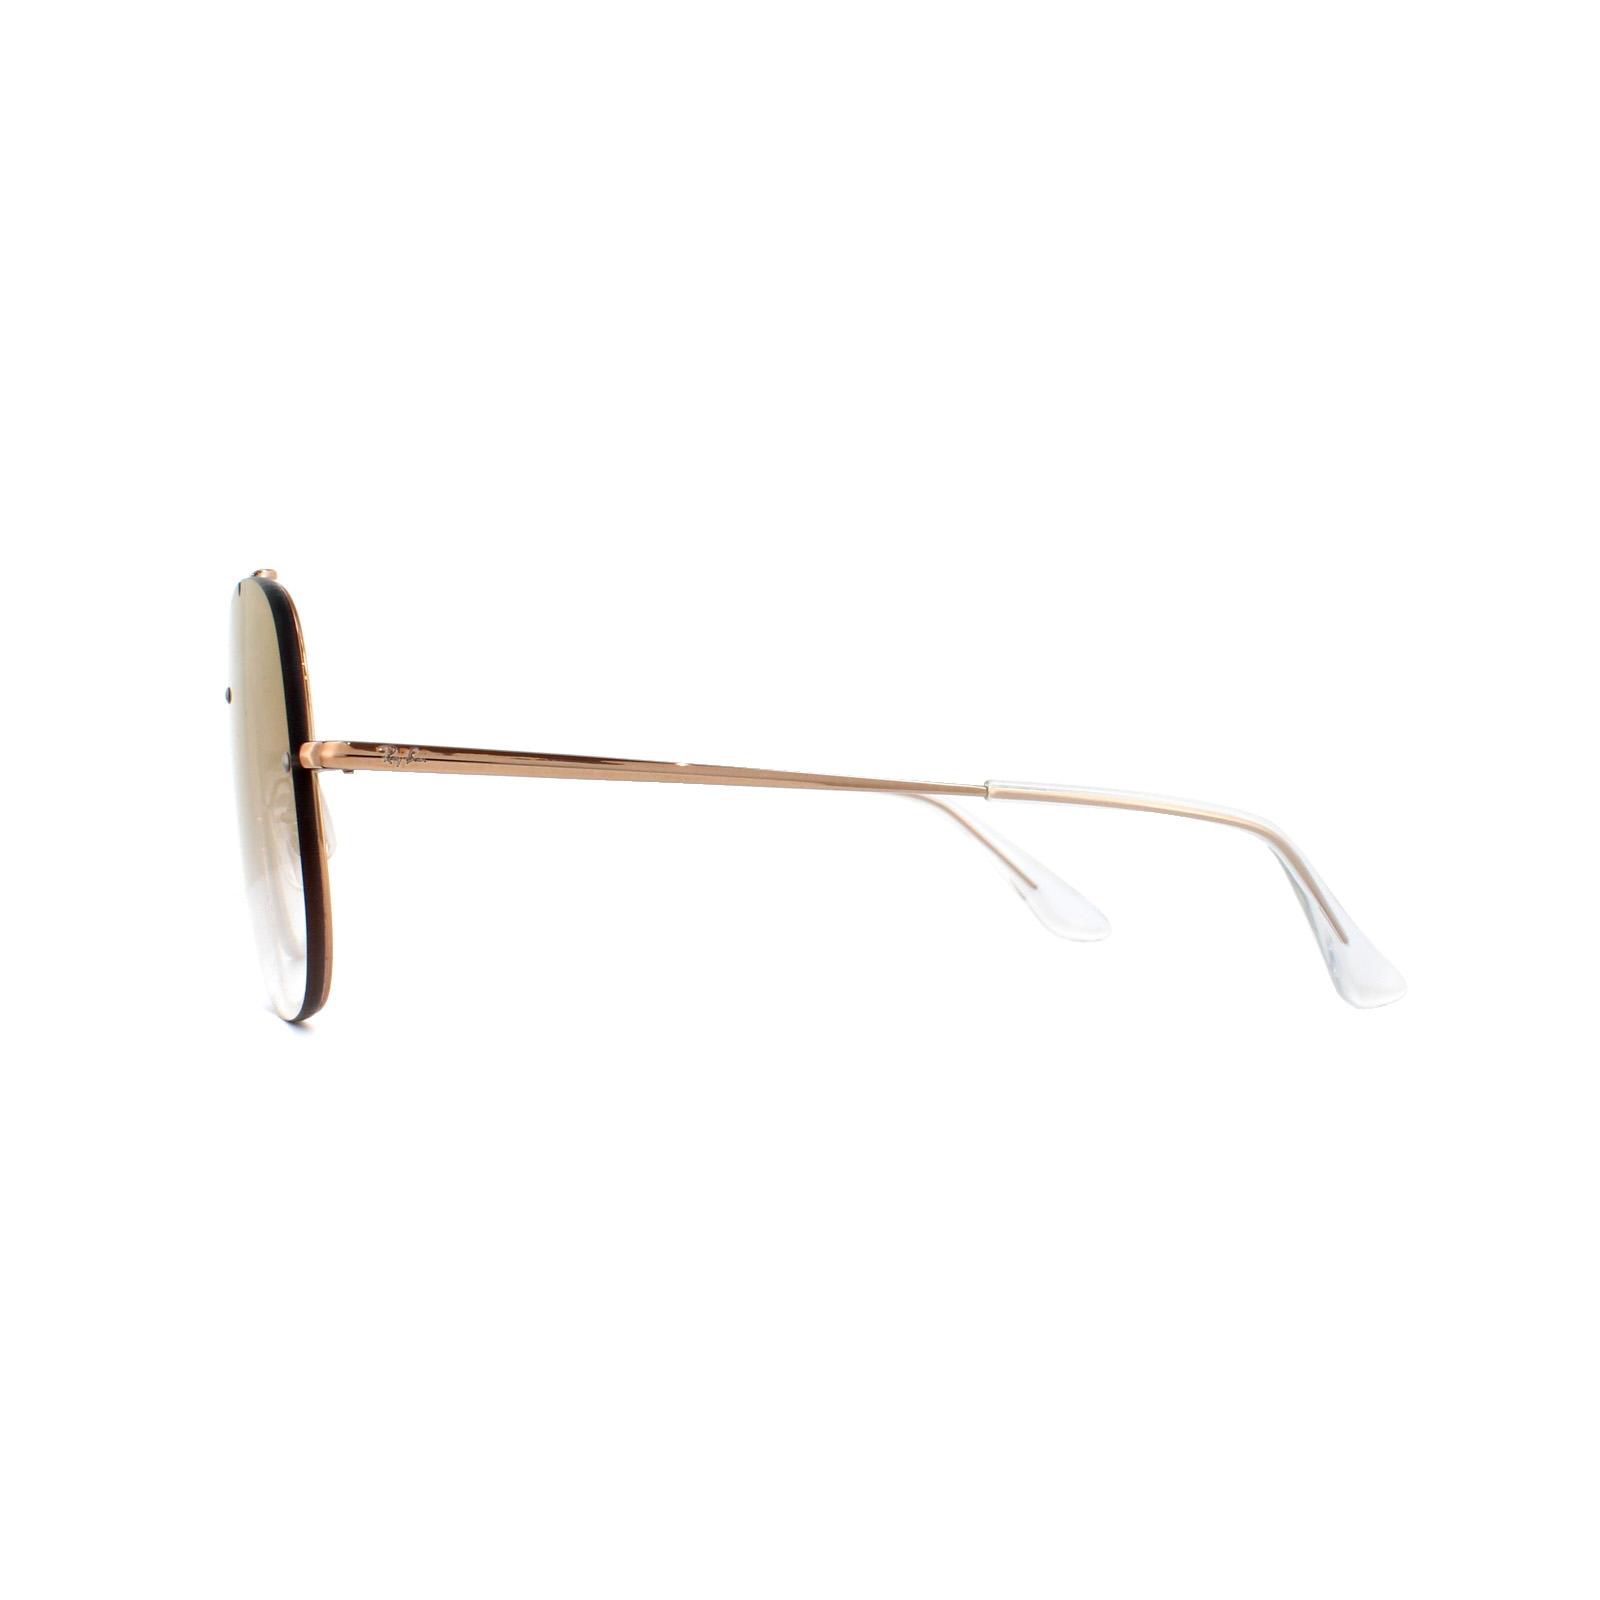 976fbb4e55 Sentinel Ray-Ban Sunglasses Blaze The General RB3583N 9035V0 Copper Clear  Gradient Red Mi